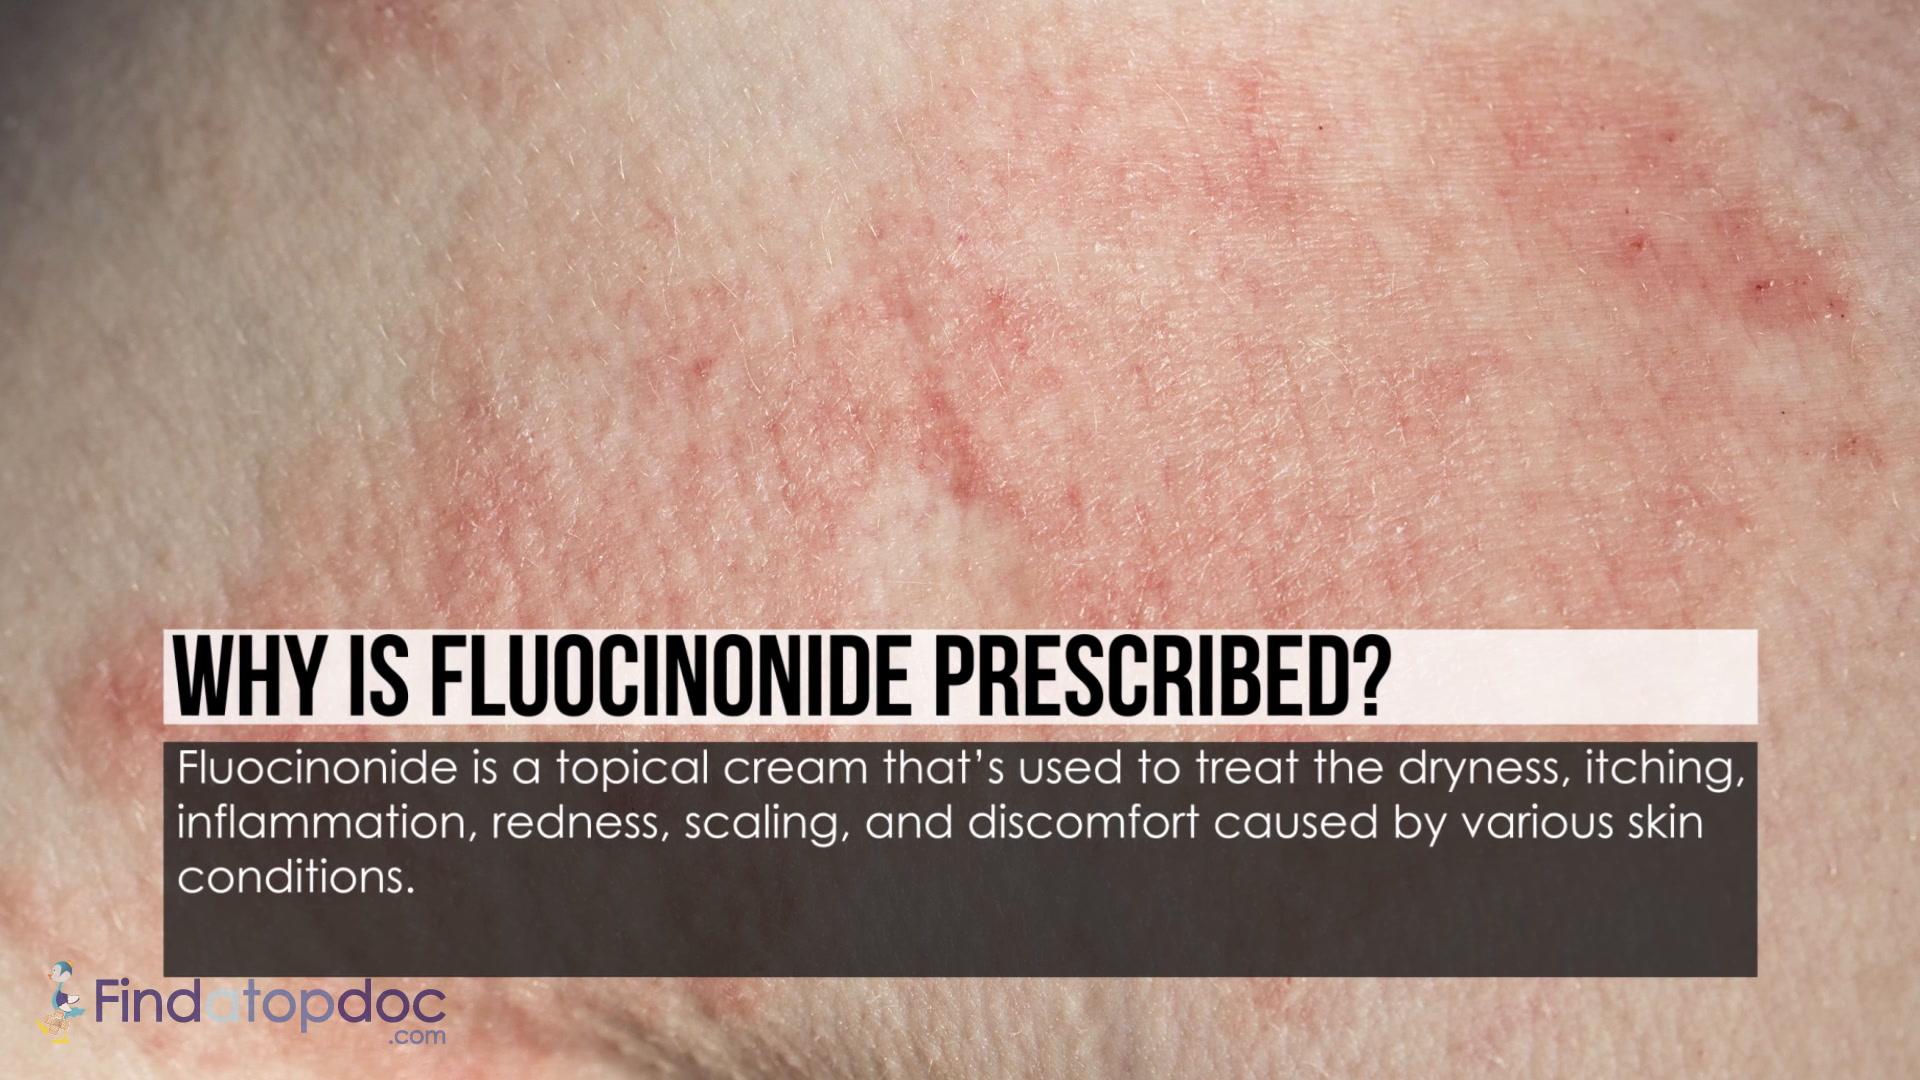 Fluocinonide advise